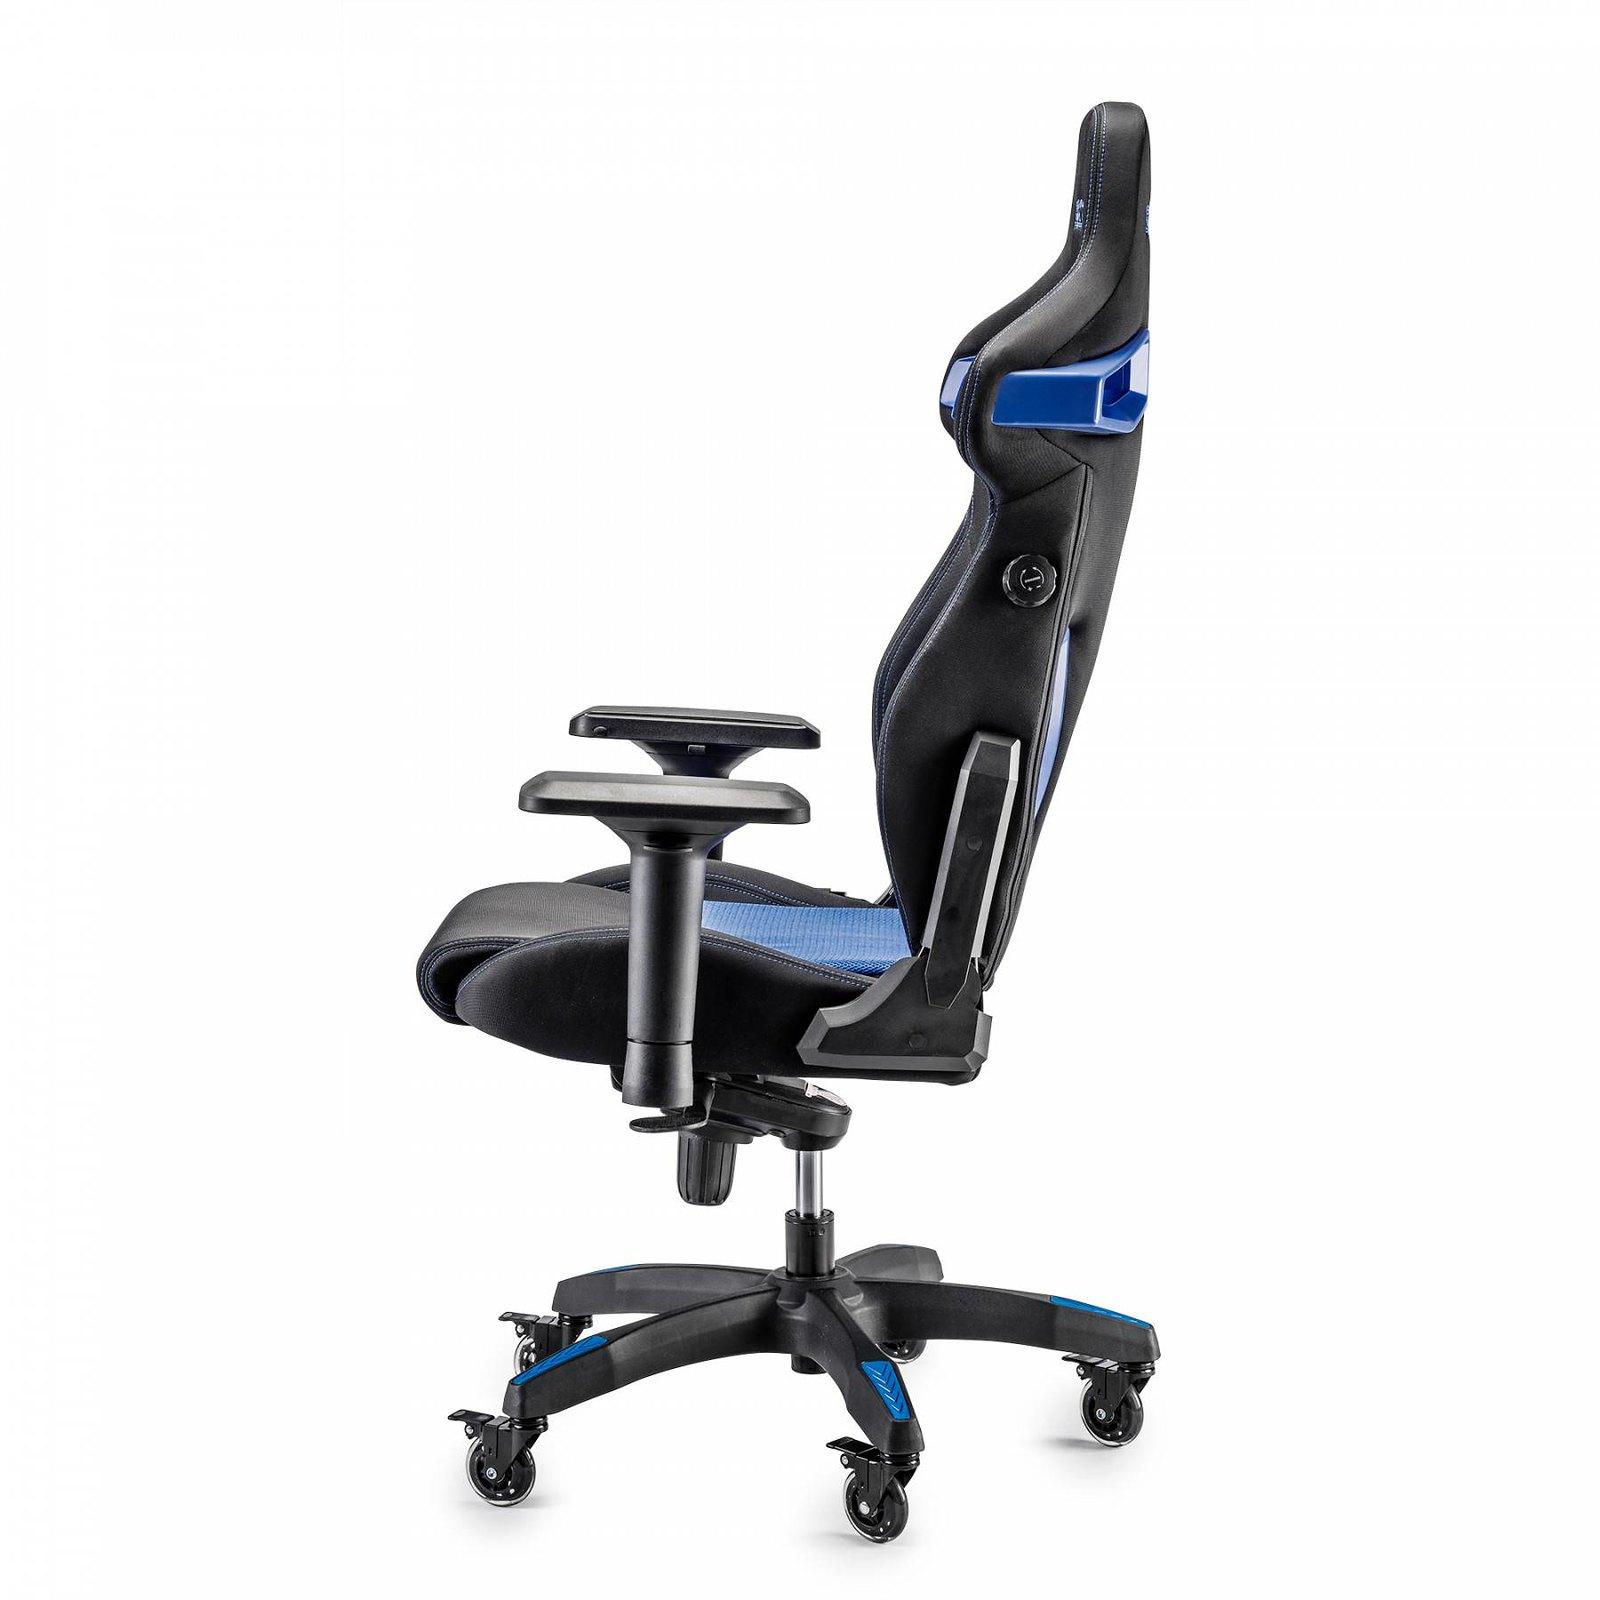 Superb Bsimracing Machost Co Dining Chair Design Ideas Machostcouk